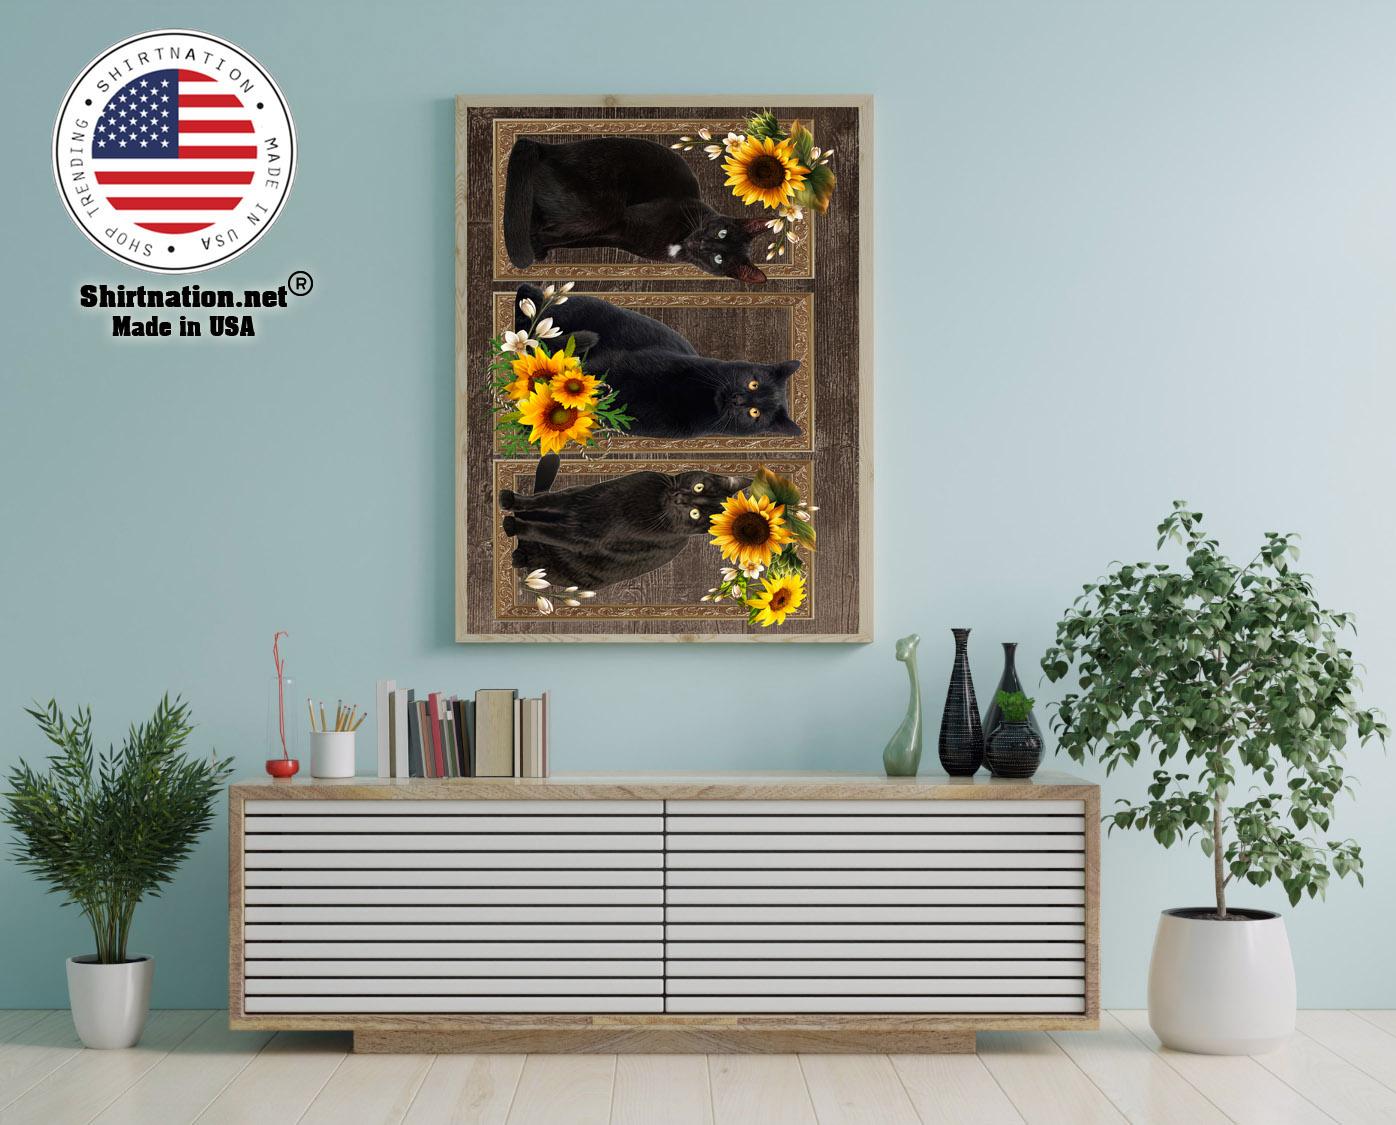 Black cat sunflower frame doormat 12